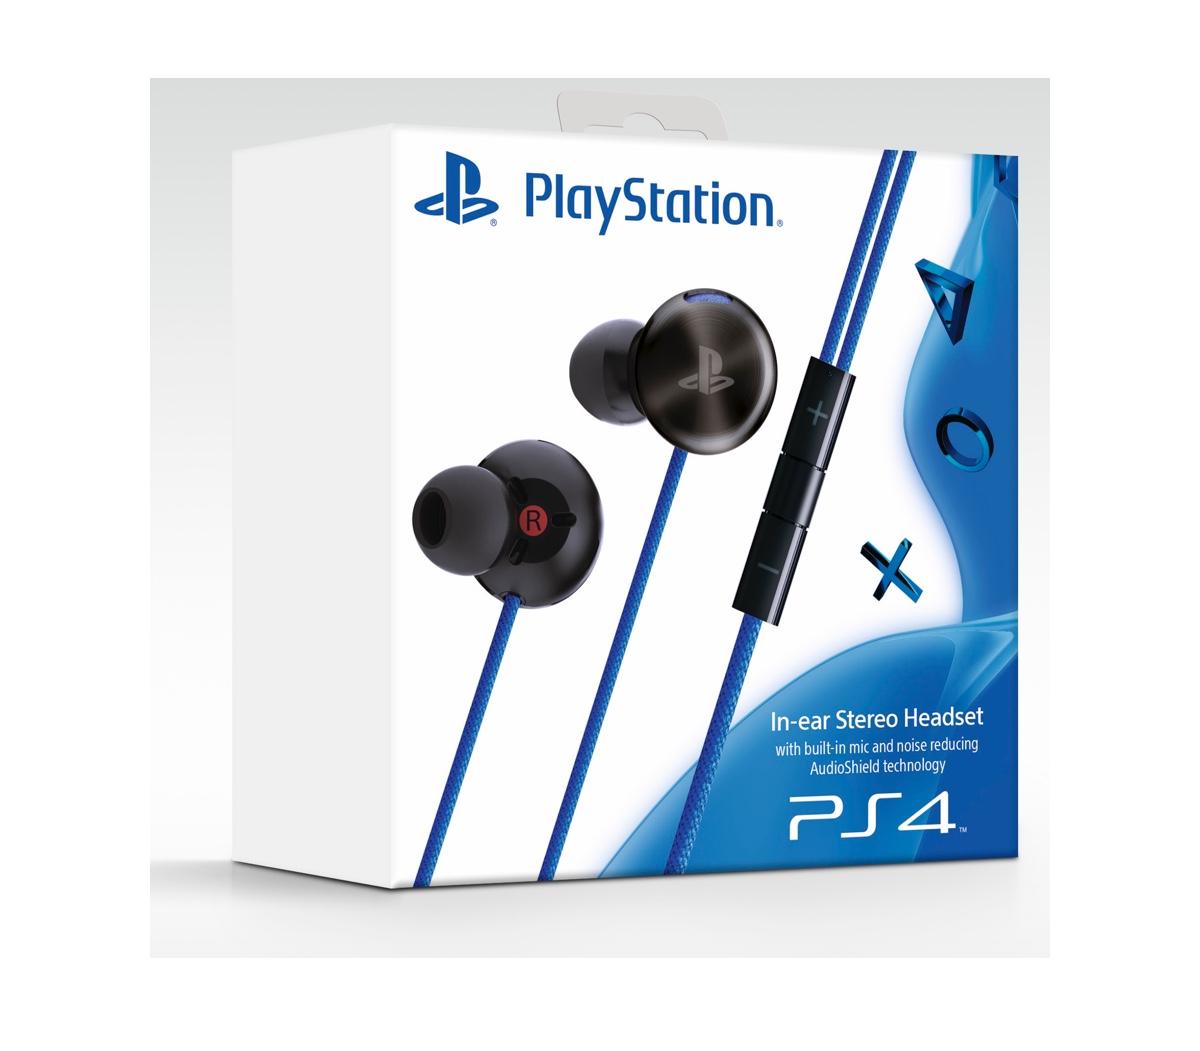 auricolari Playstation 4 icon 2 1200